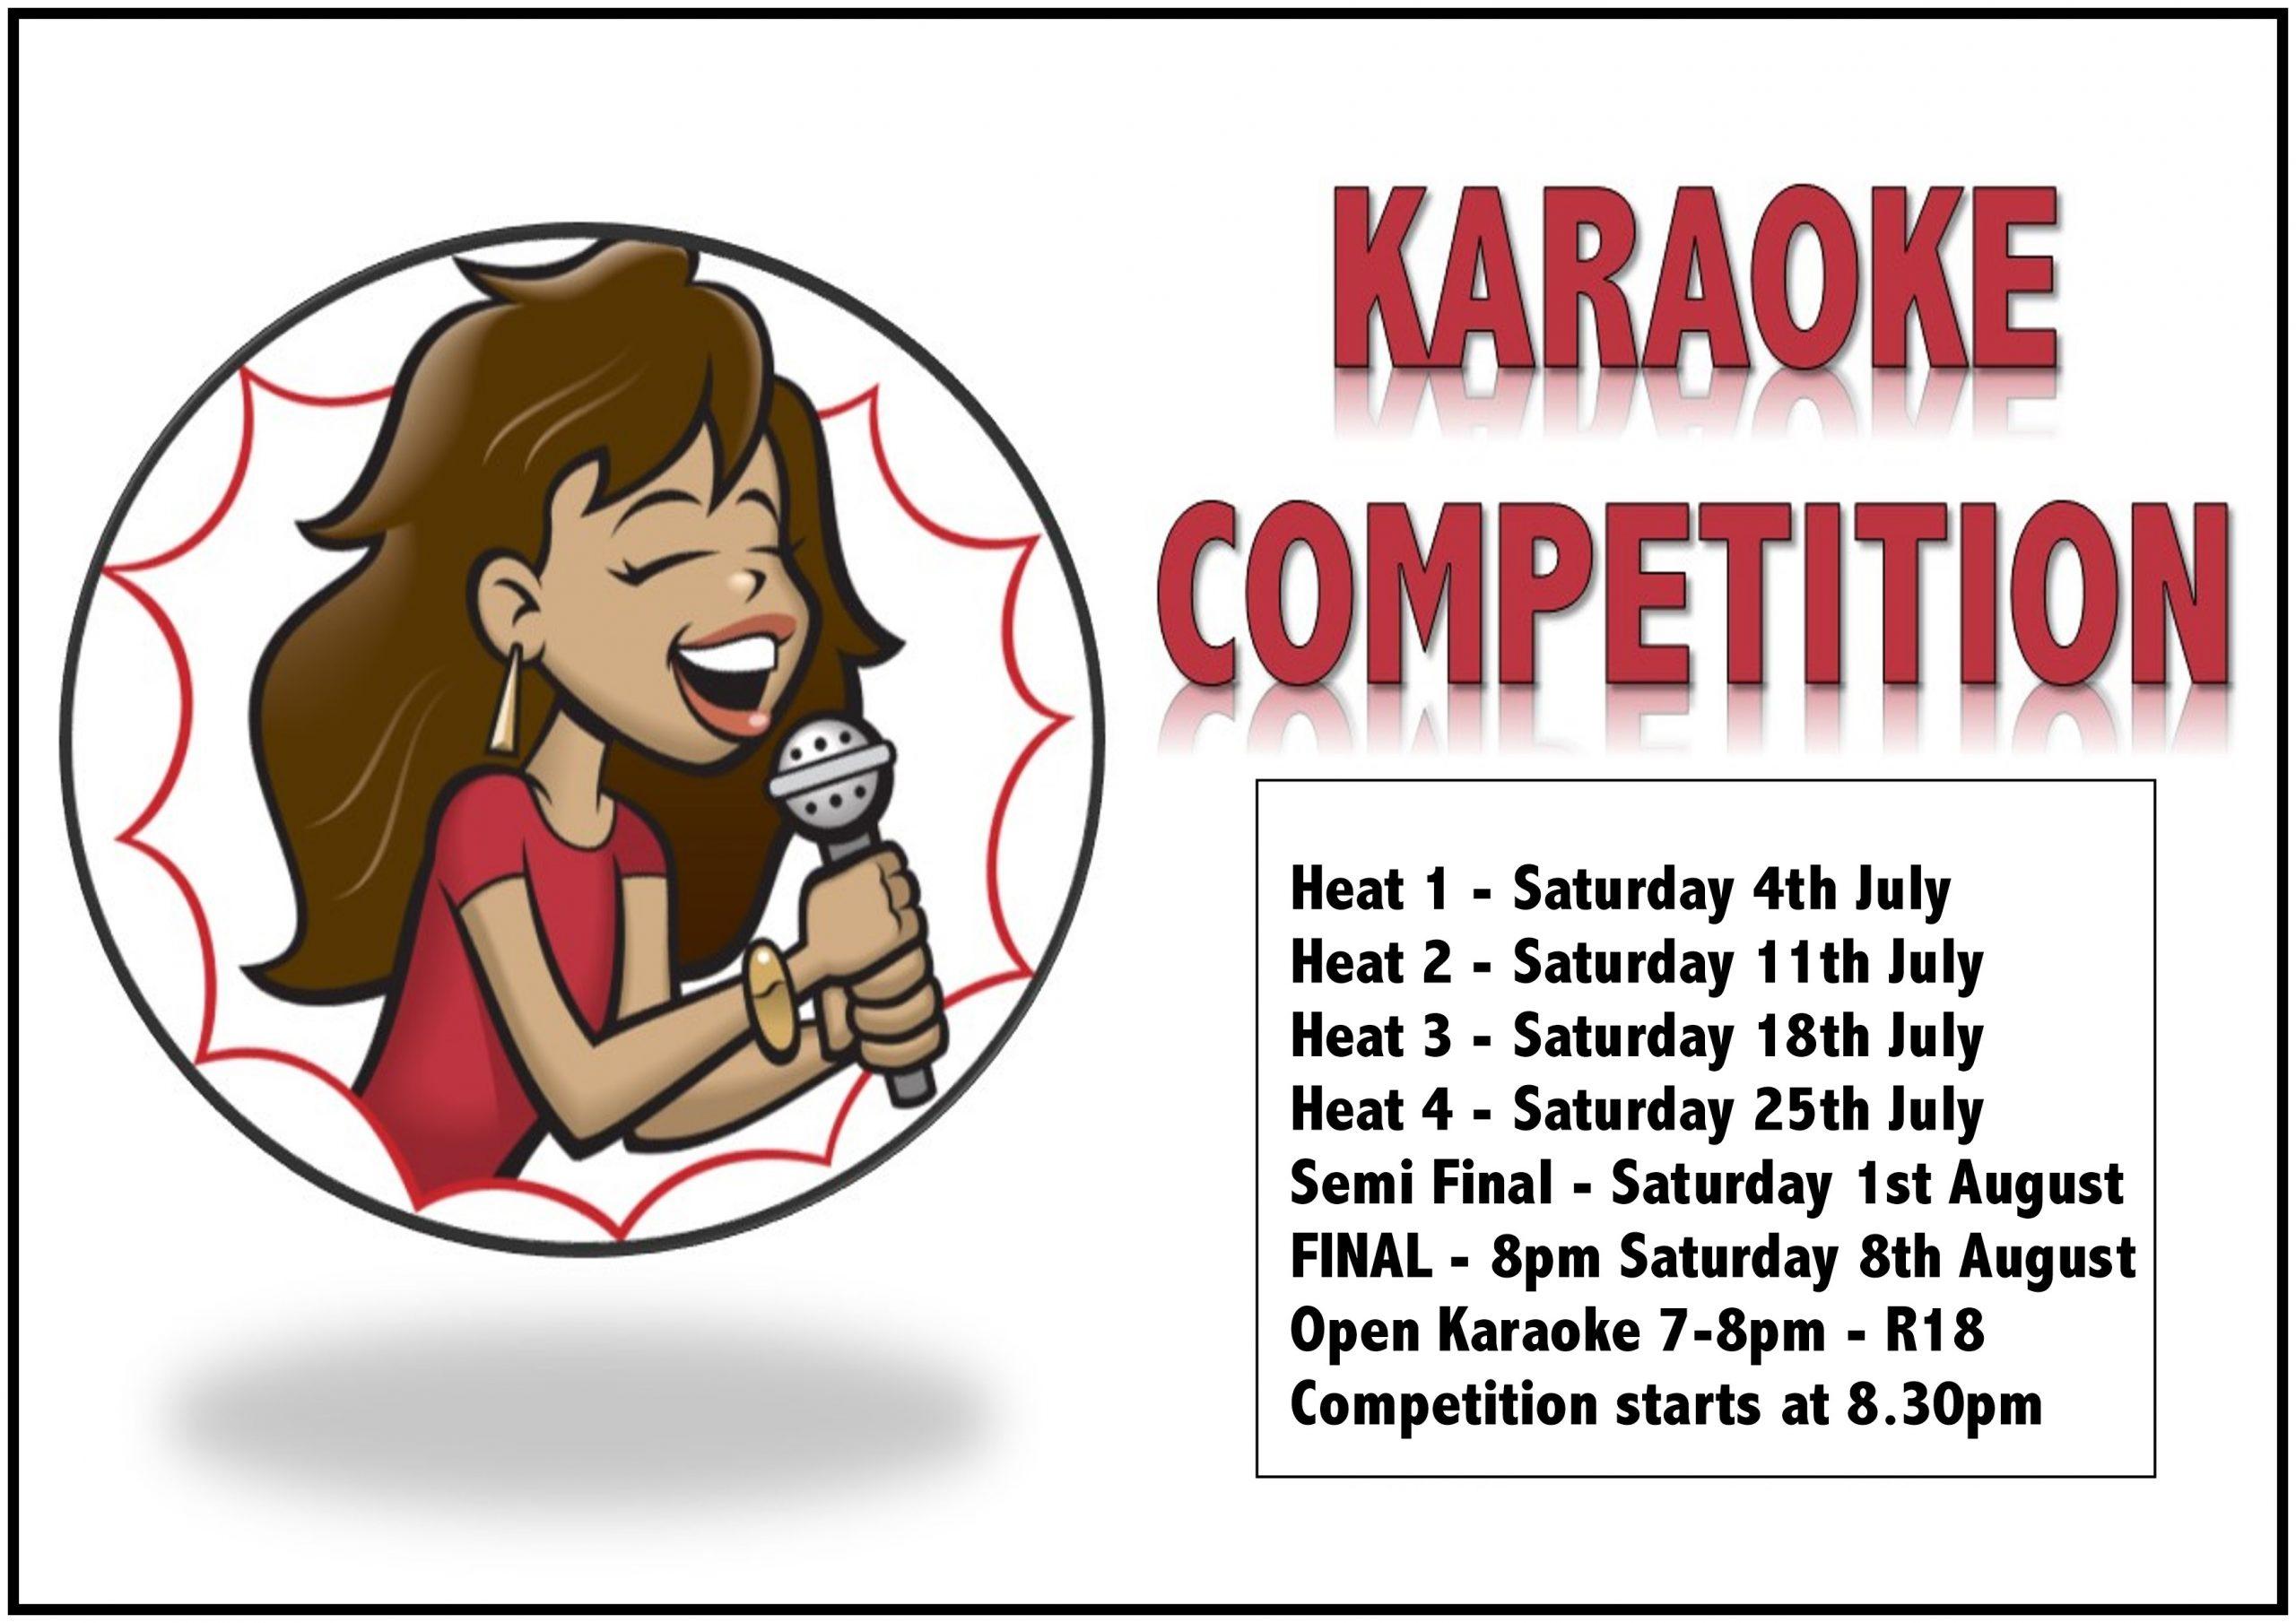 Karaoke Competetion